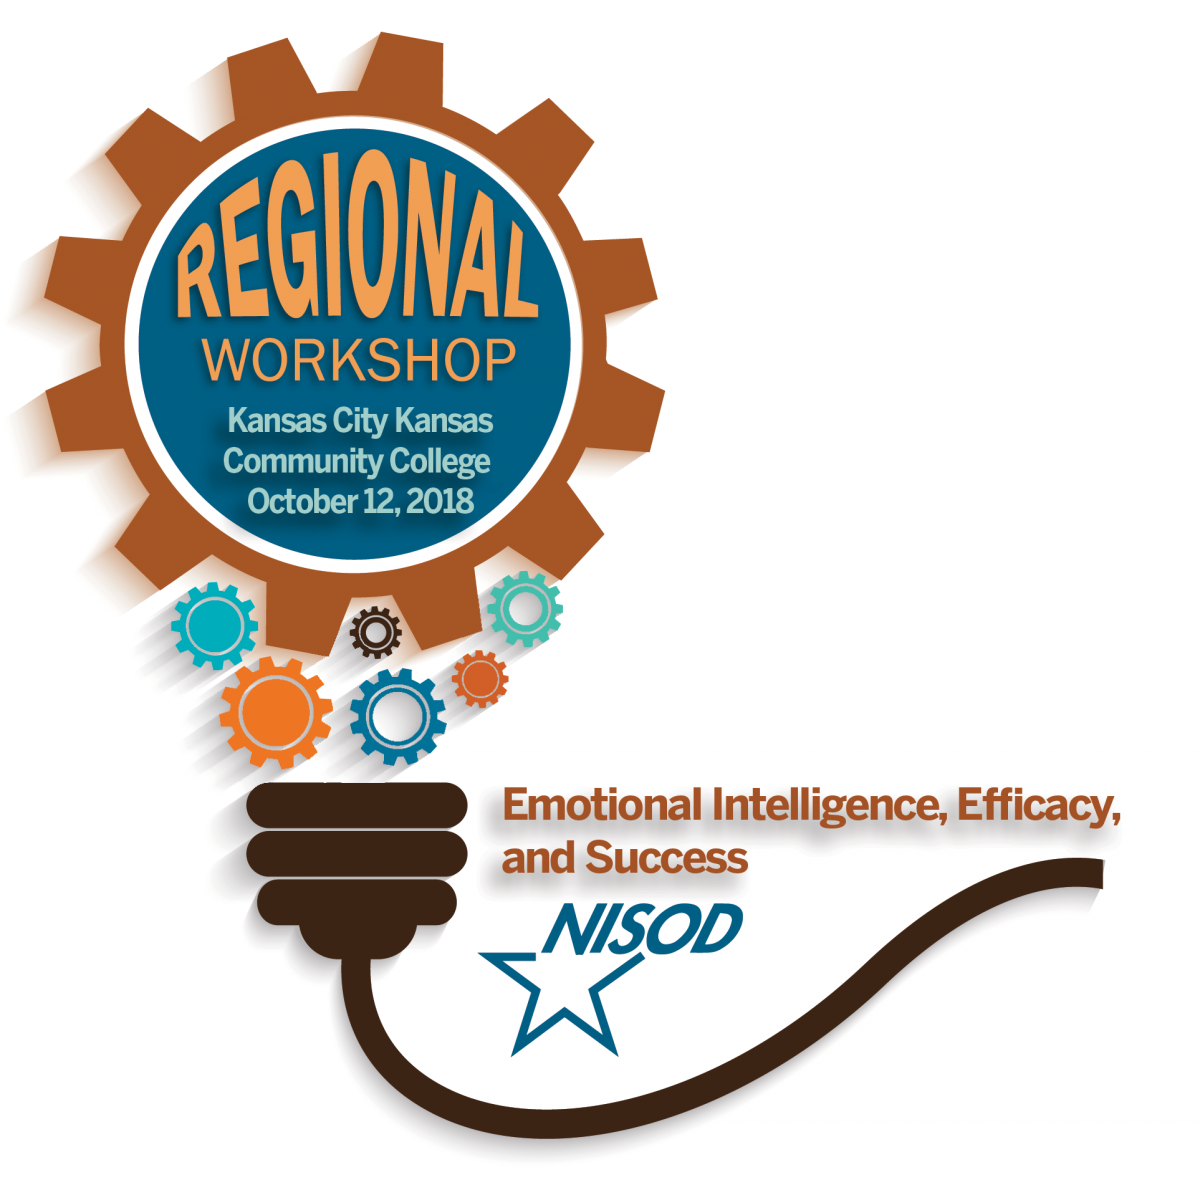 NISOD Regional Workshop - Kansas City Kansas Community College Regional Workshop banner